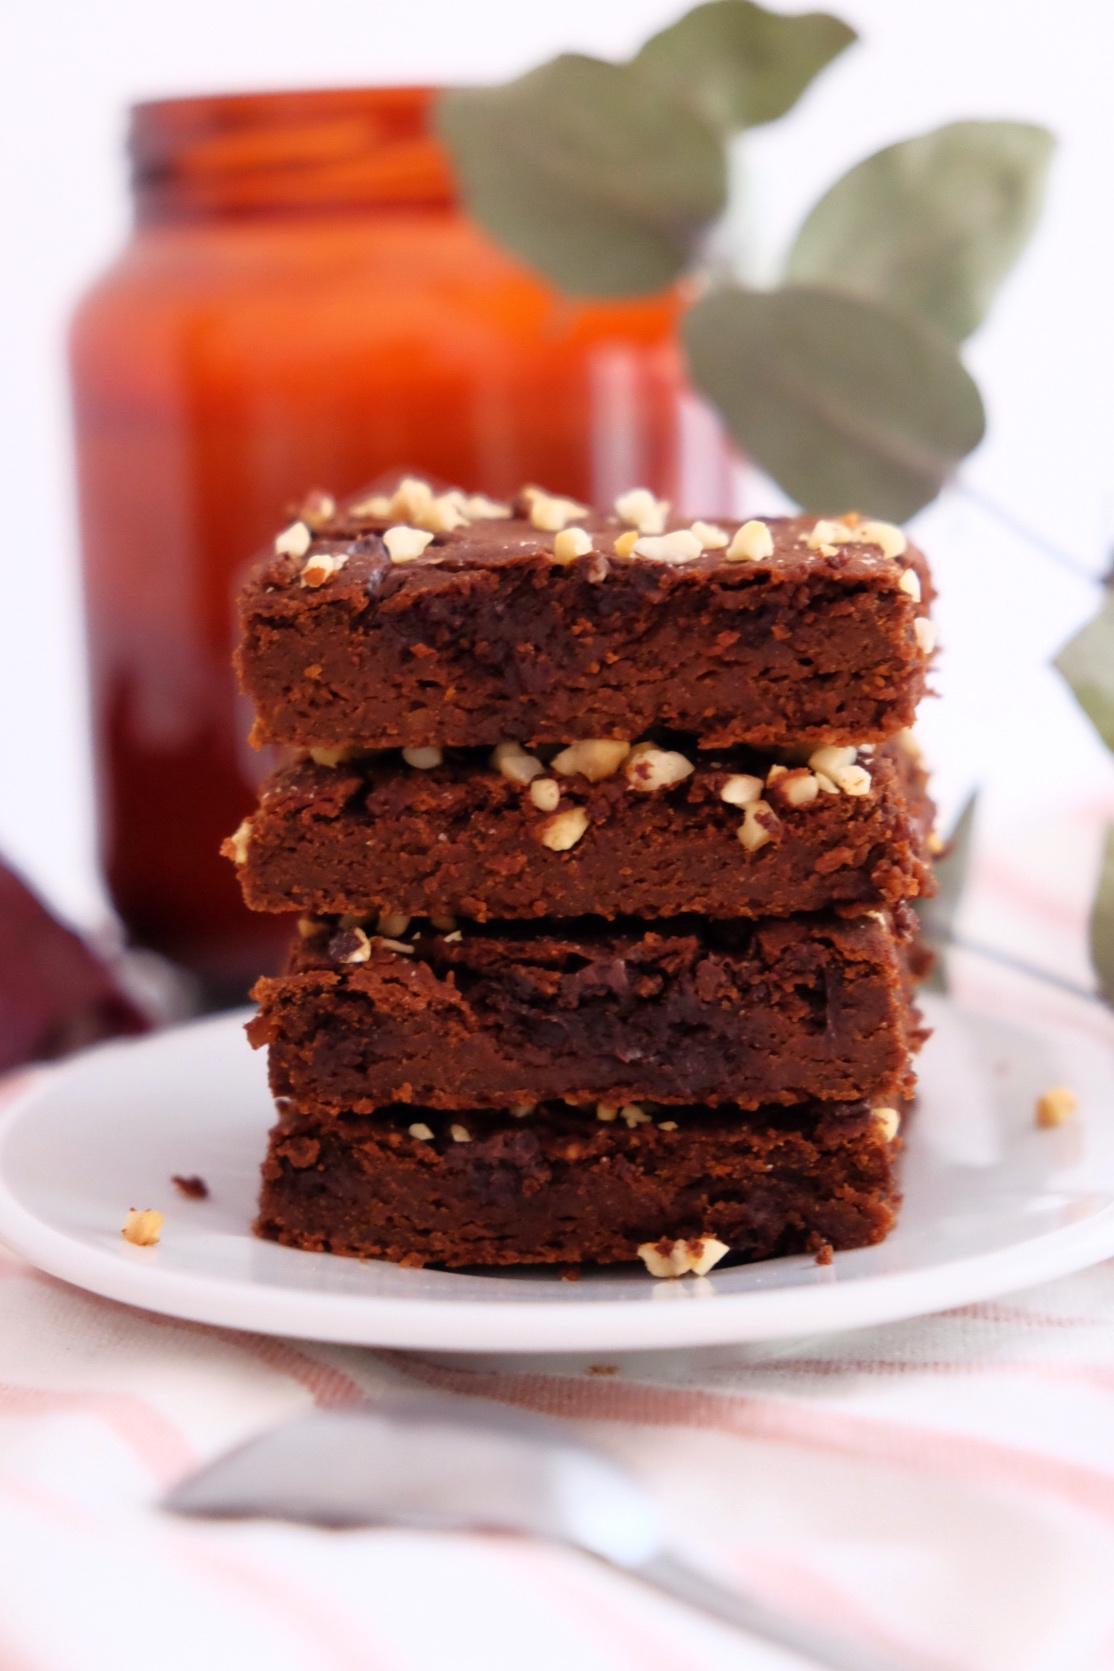 Peanut butter chickpeas brownie